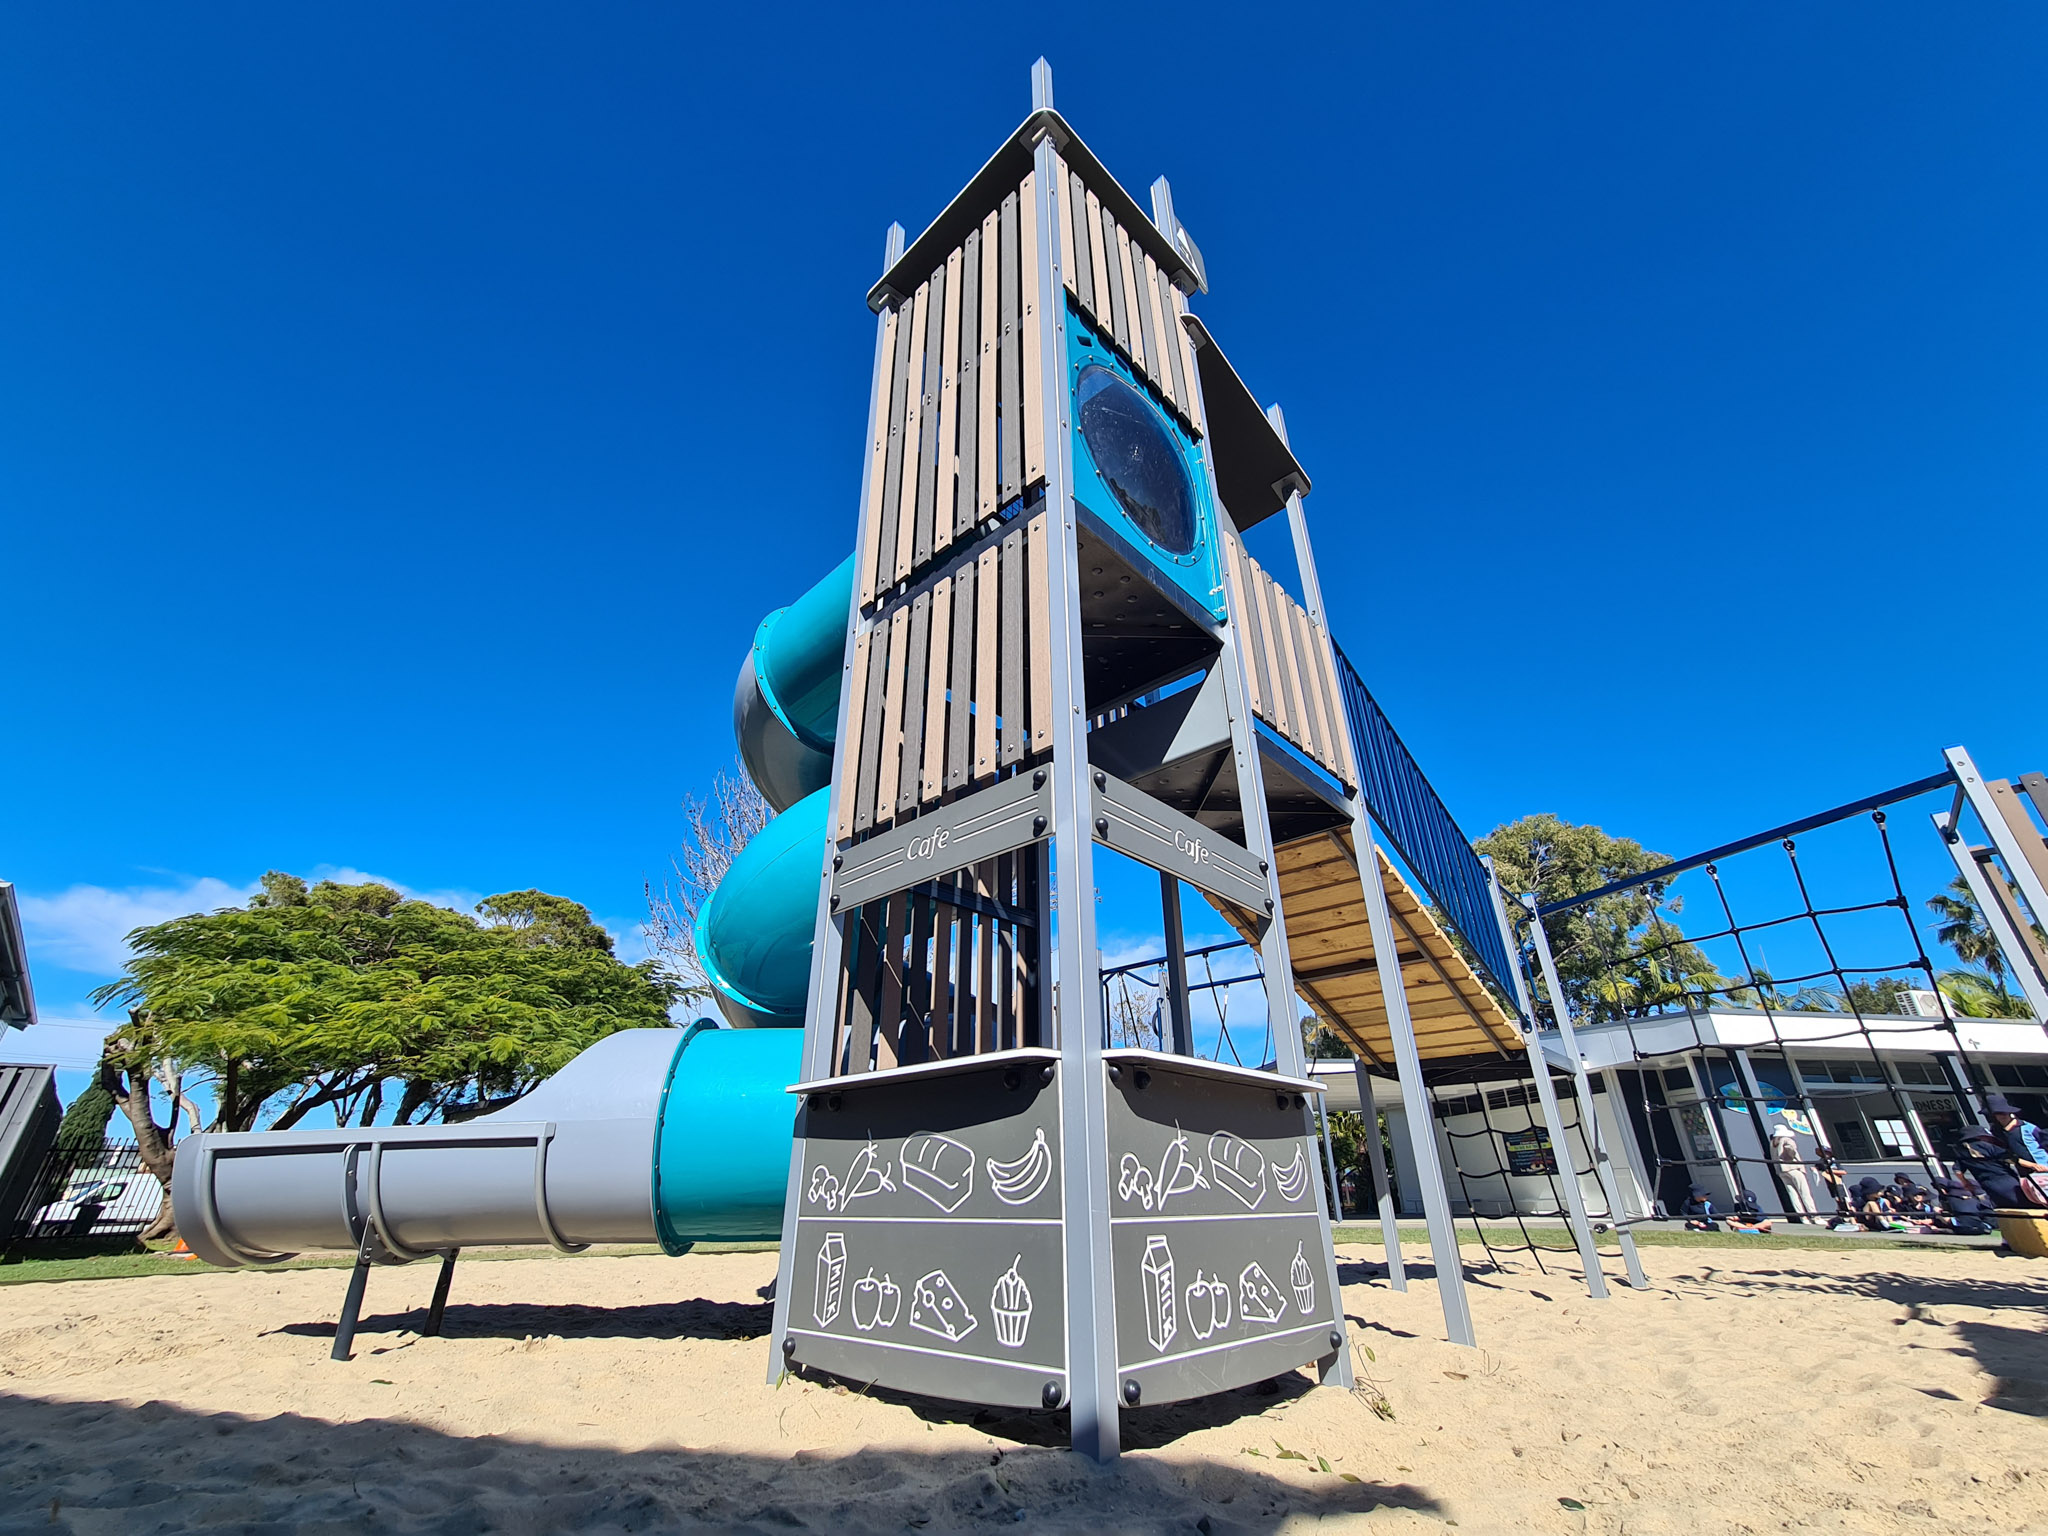 palm-beach-state-school-playrground-austek-play-08